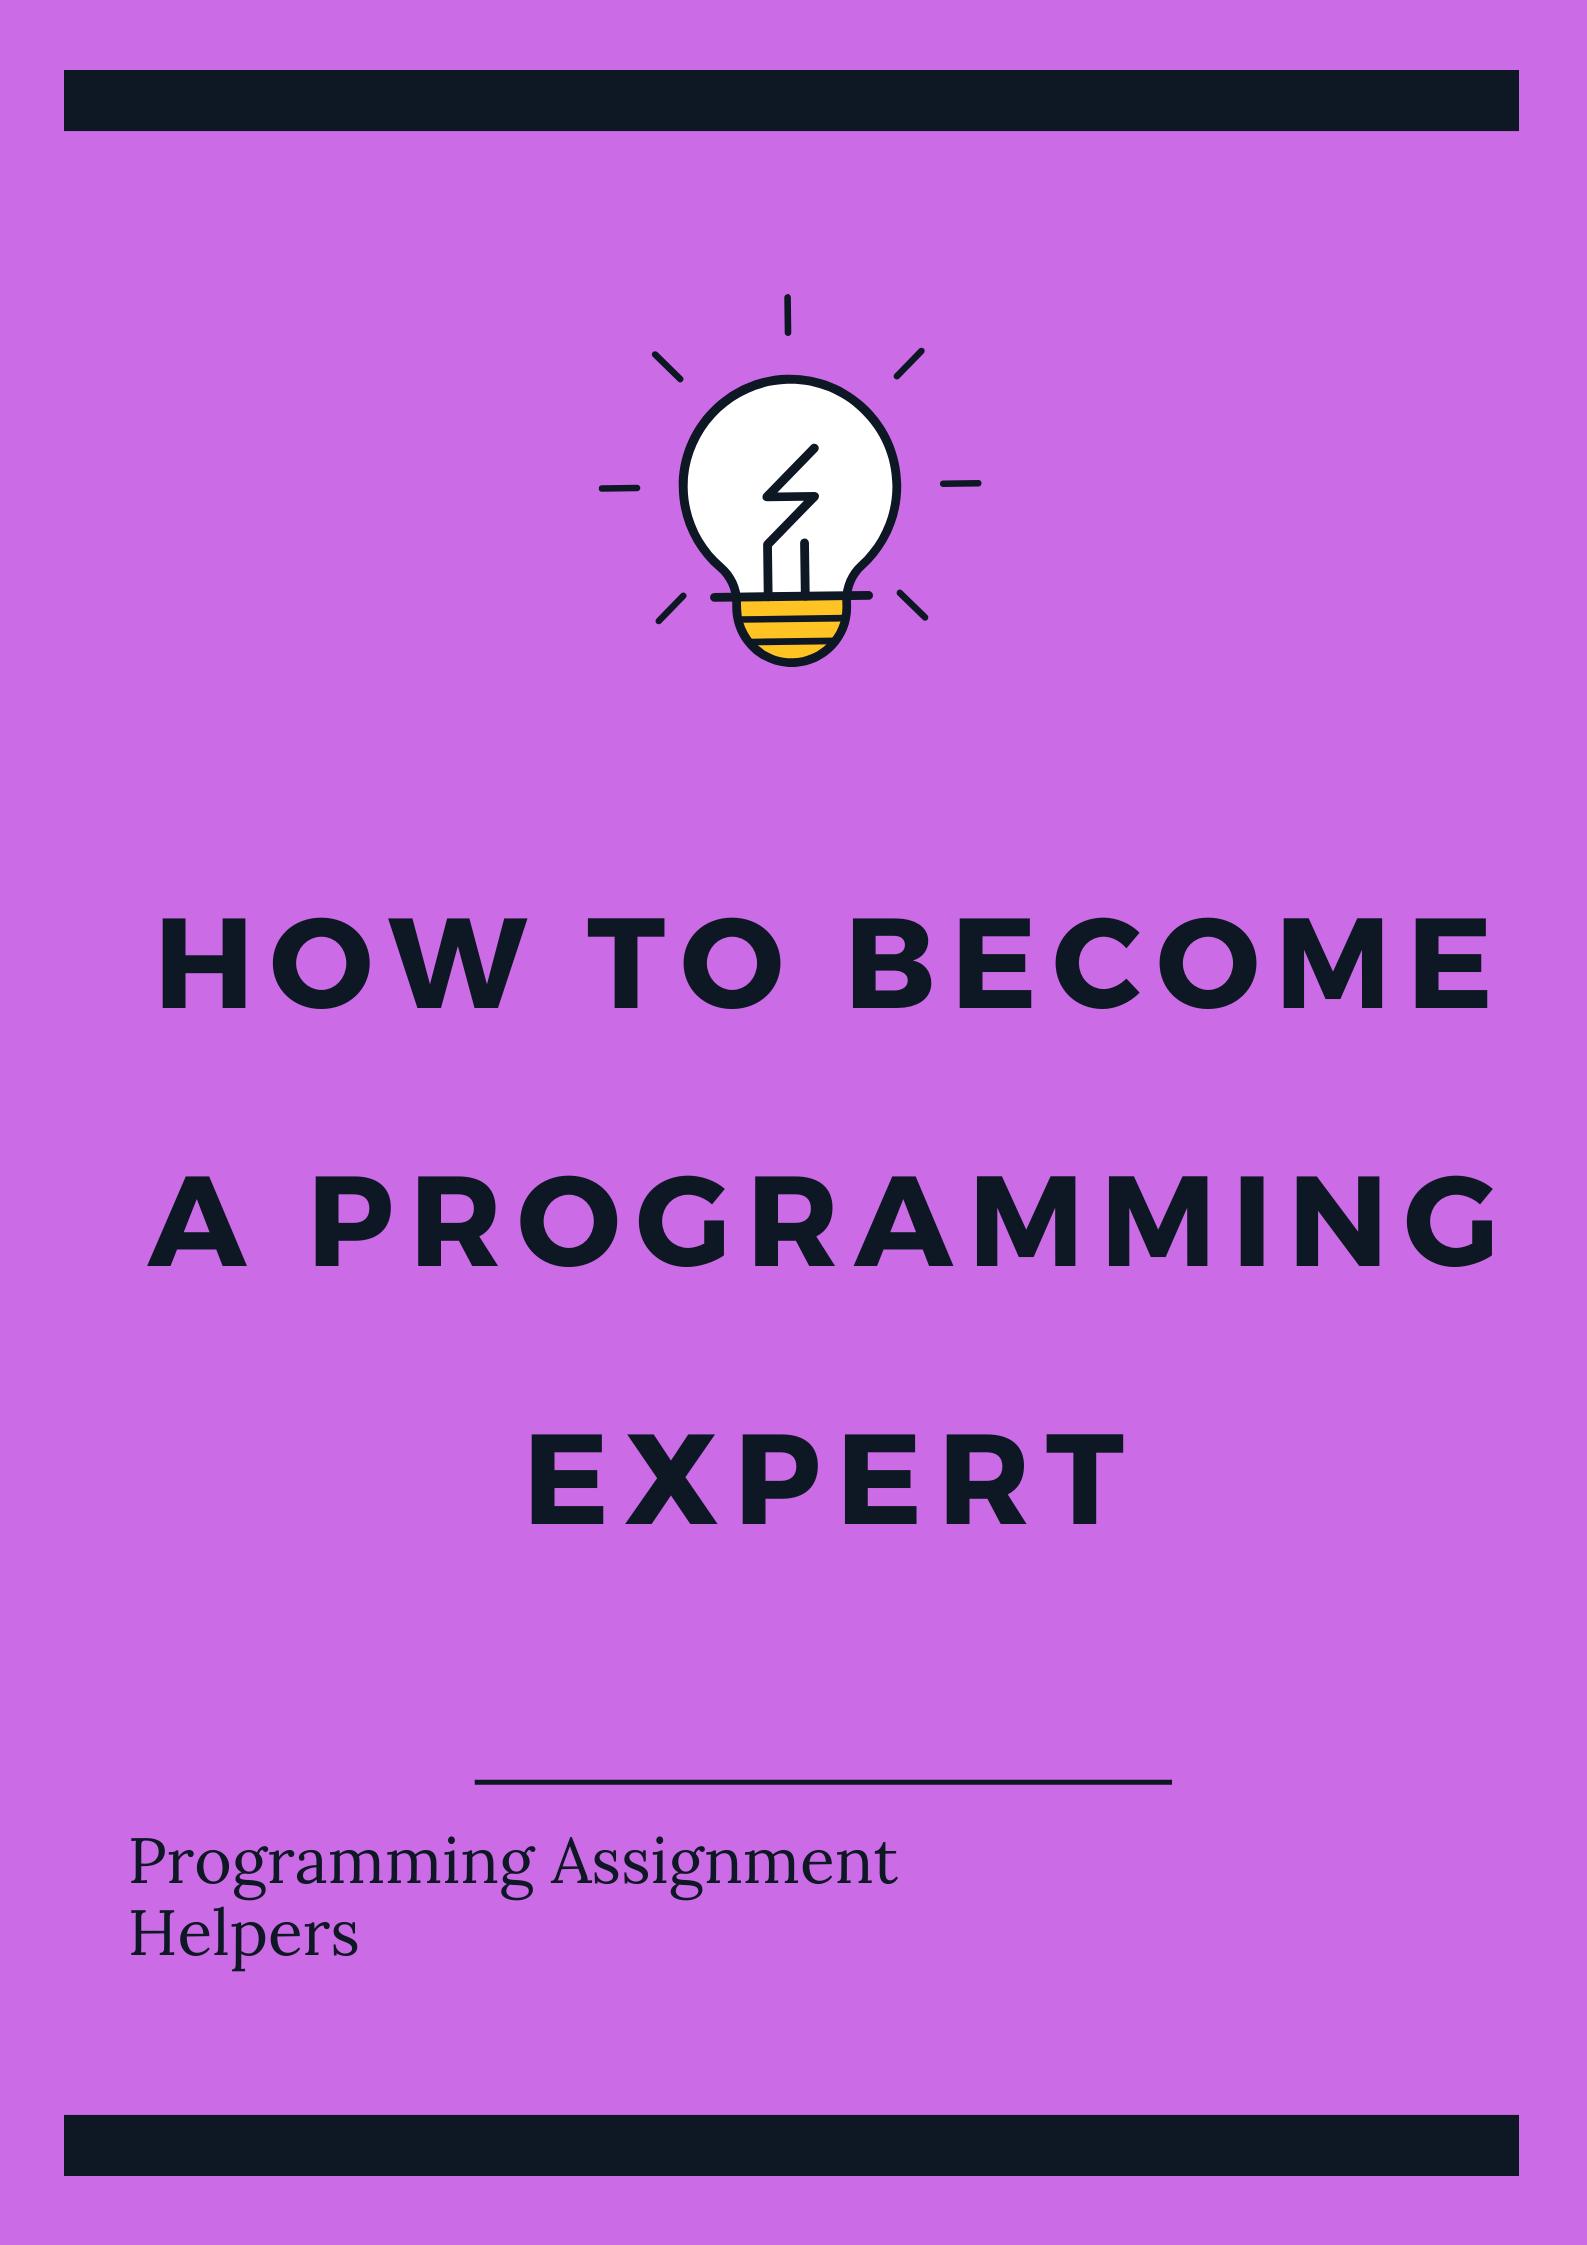 Programming Expert